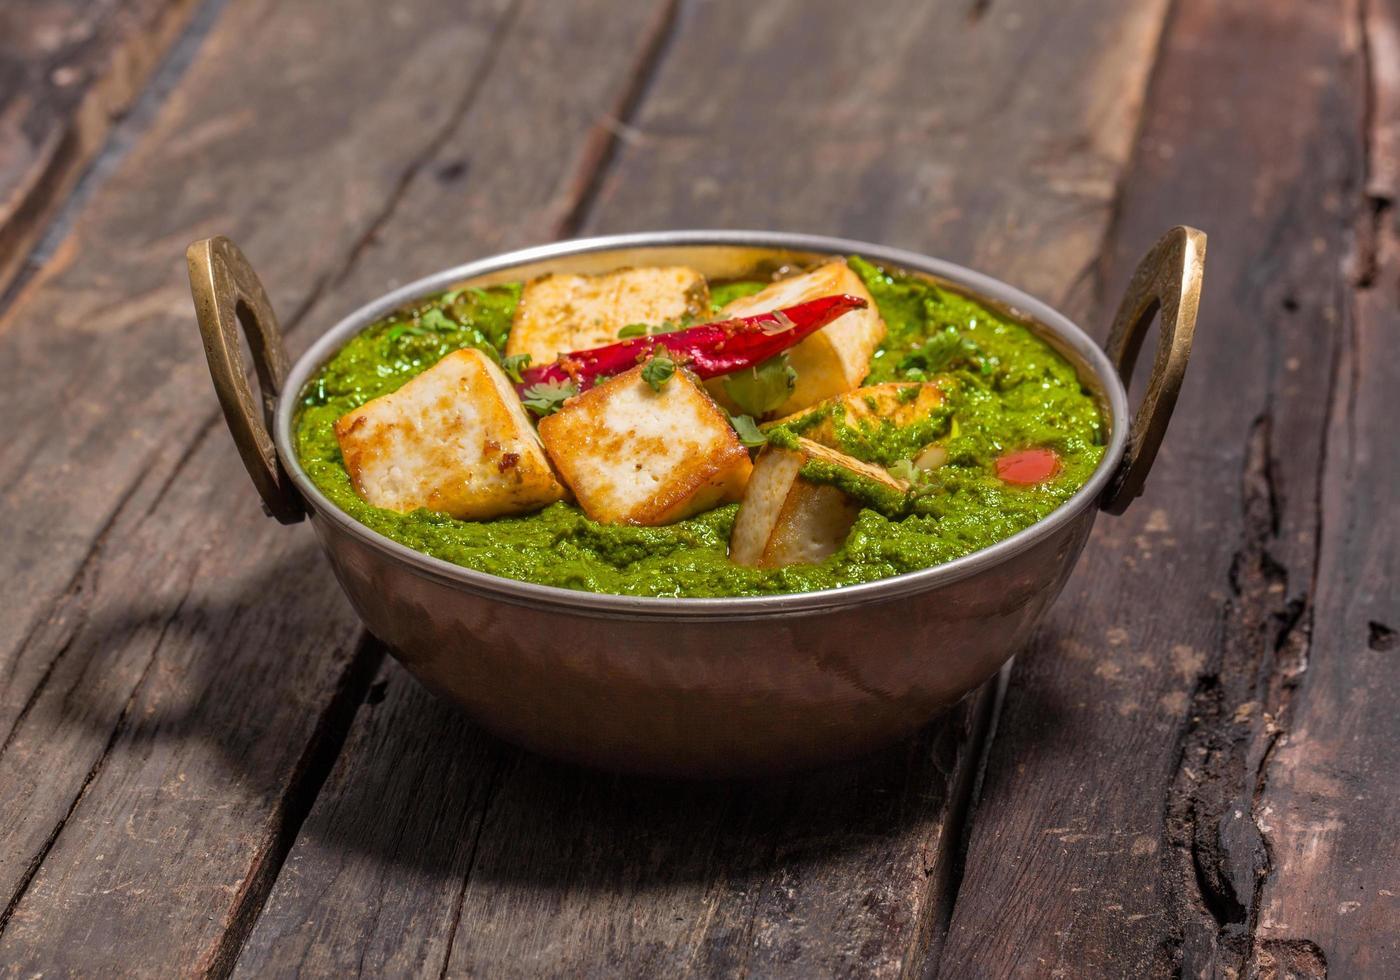 cucina indiana punjabi, palak paneer foto